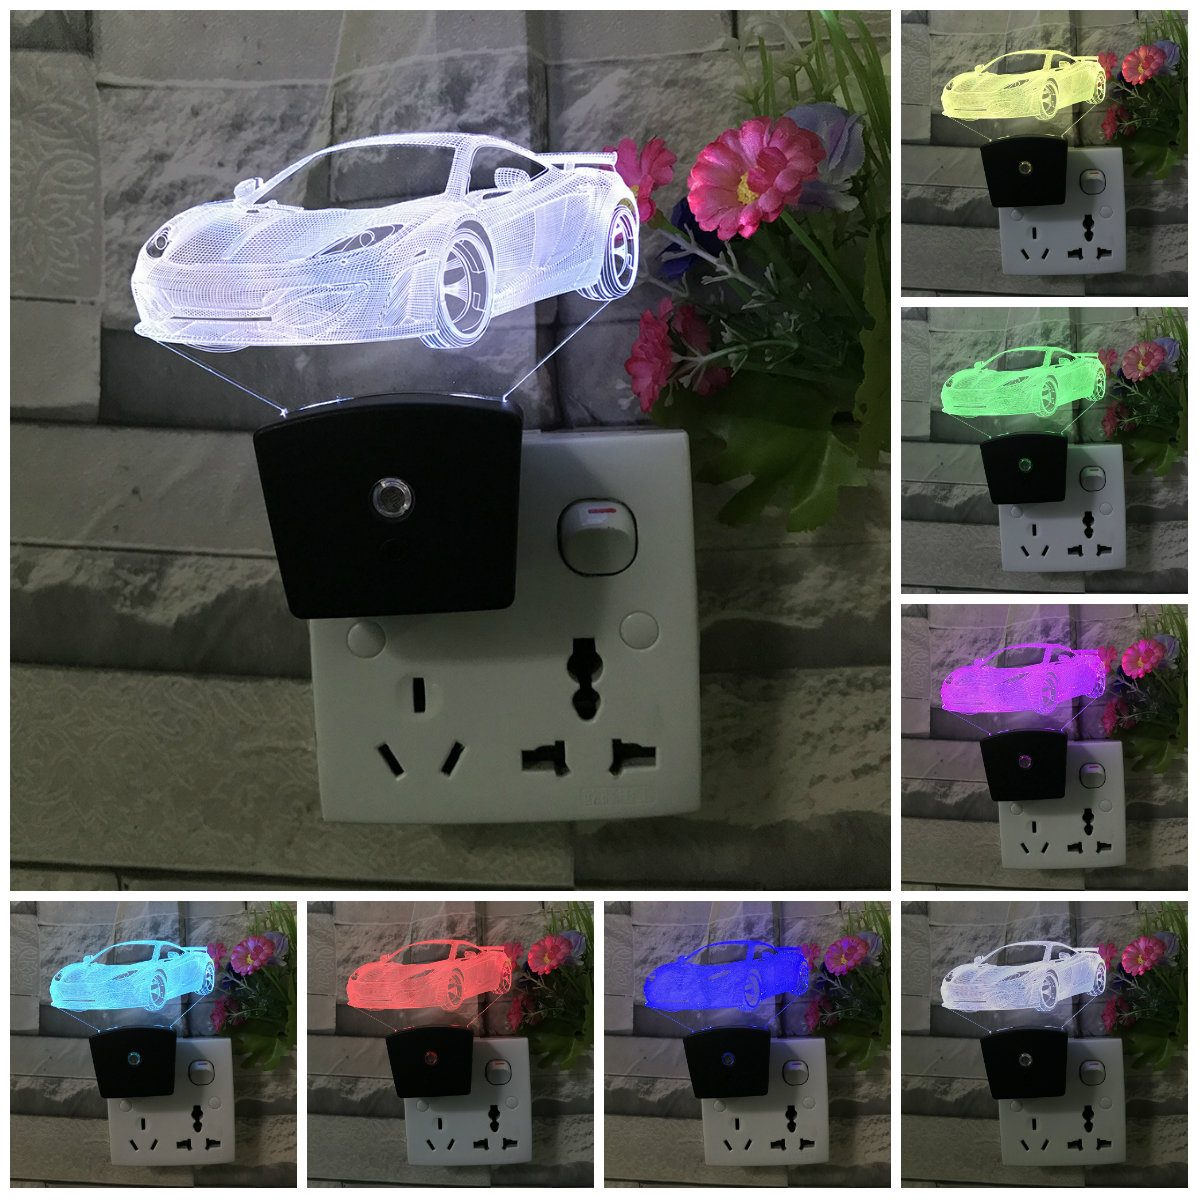 LED Night Light Lamp AC 110V 220V Light Sensor Control Auto Baby Bedroom Automate Colorful Light EU PLUG Wall Lamp IY103103-8